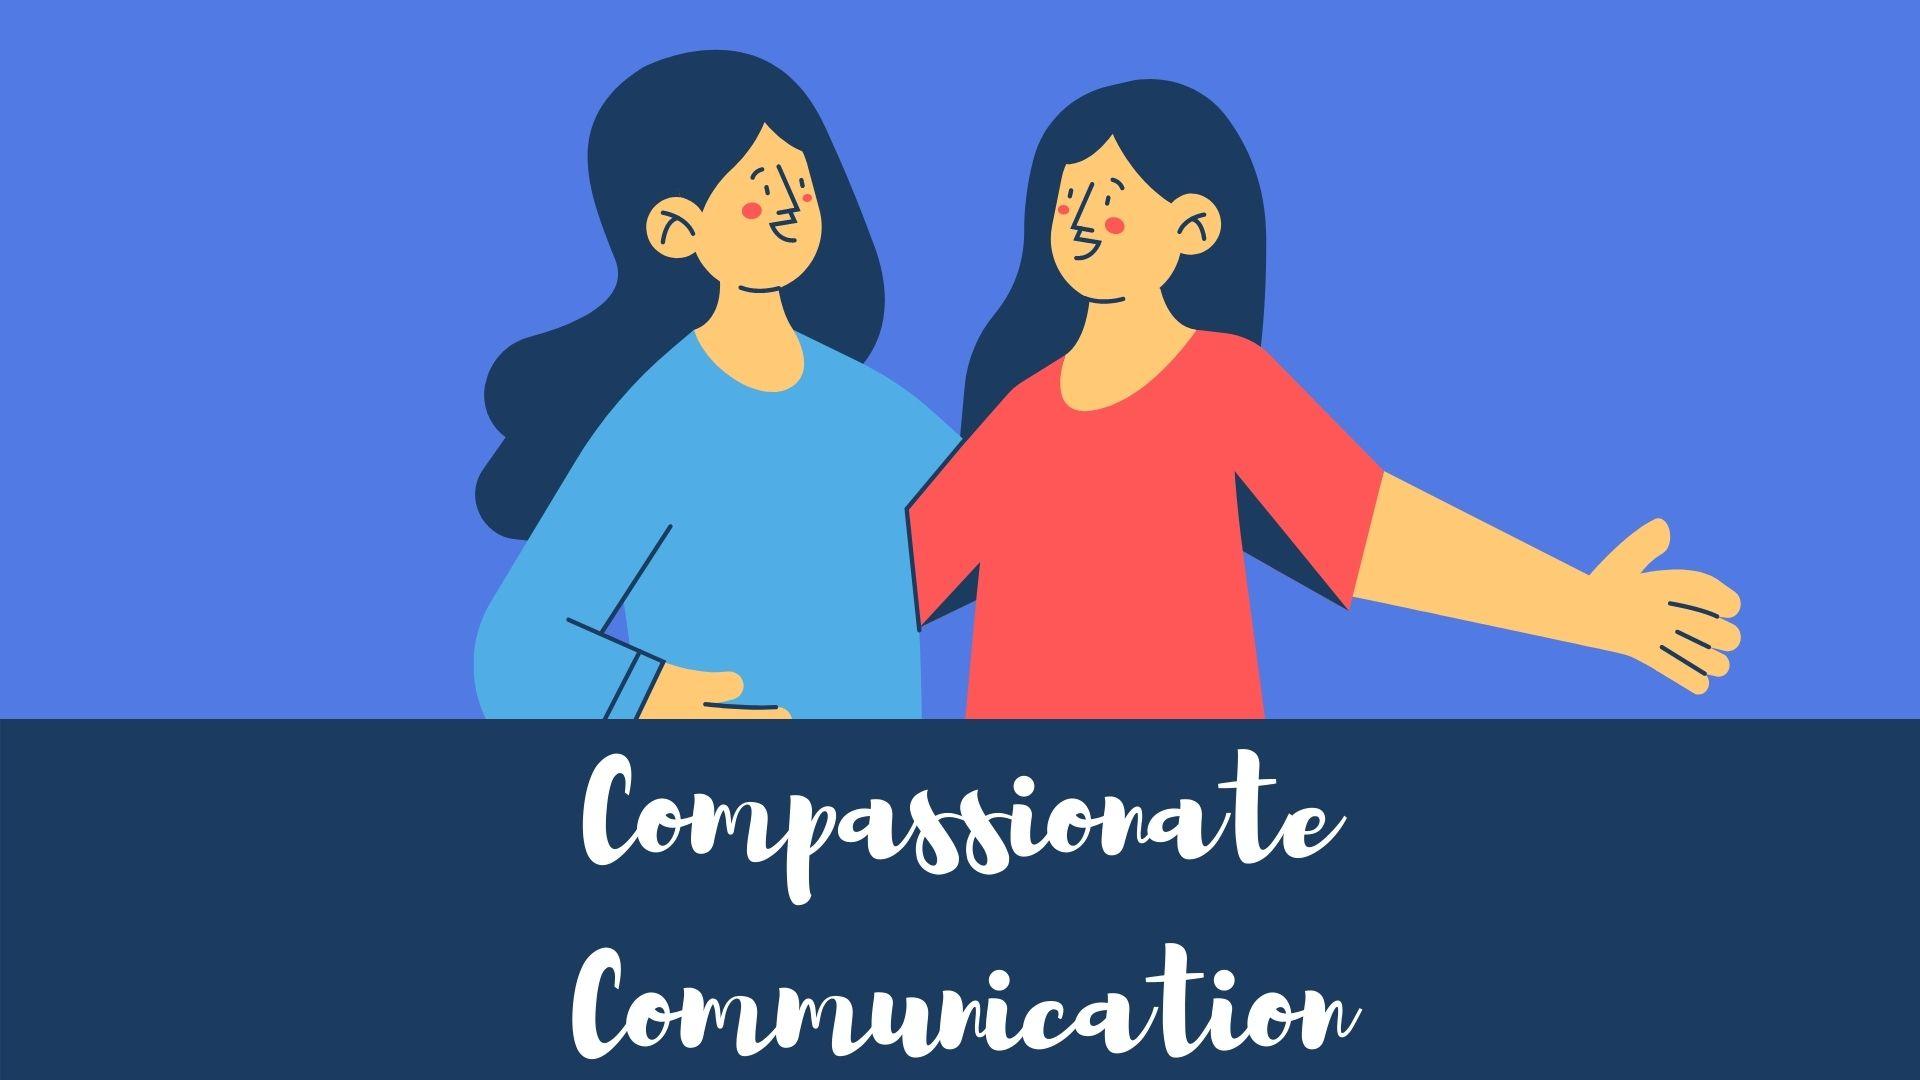 Compassionate Communication Course Image GoEdu